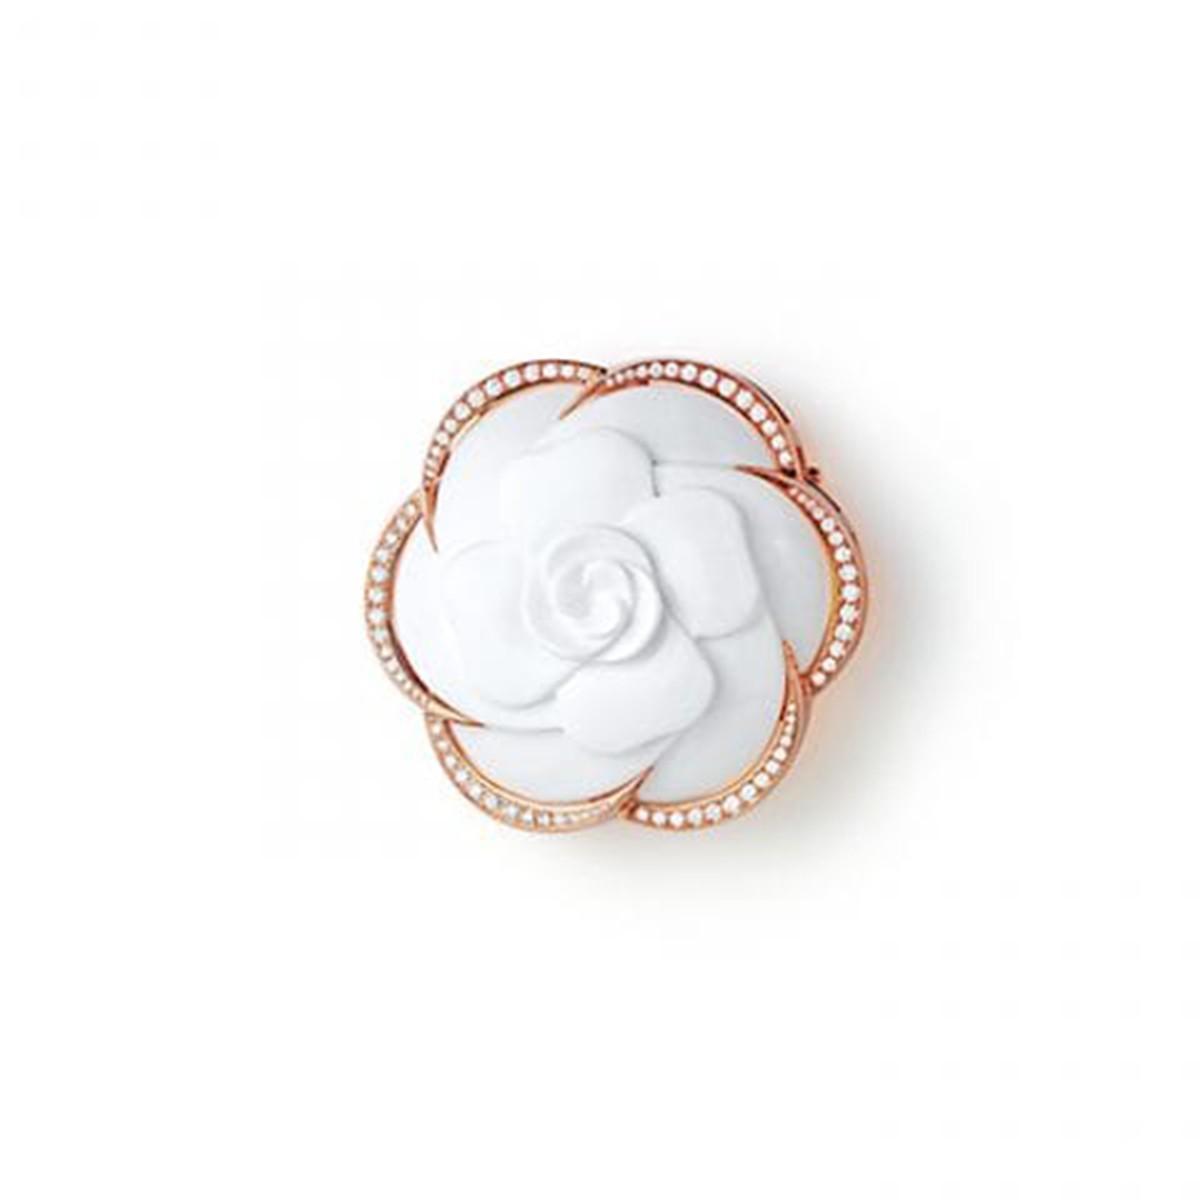 Lady of Camellias Brosche Preis